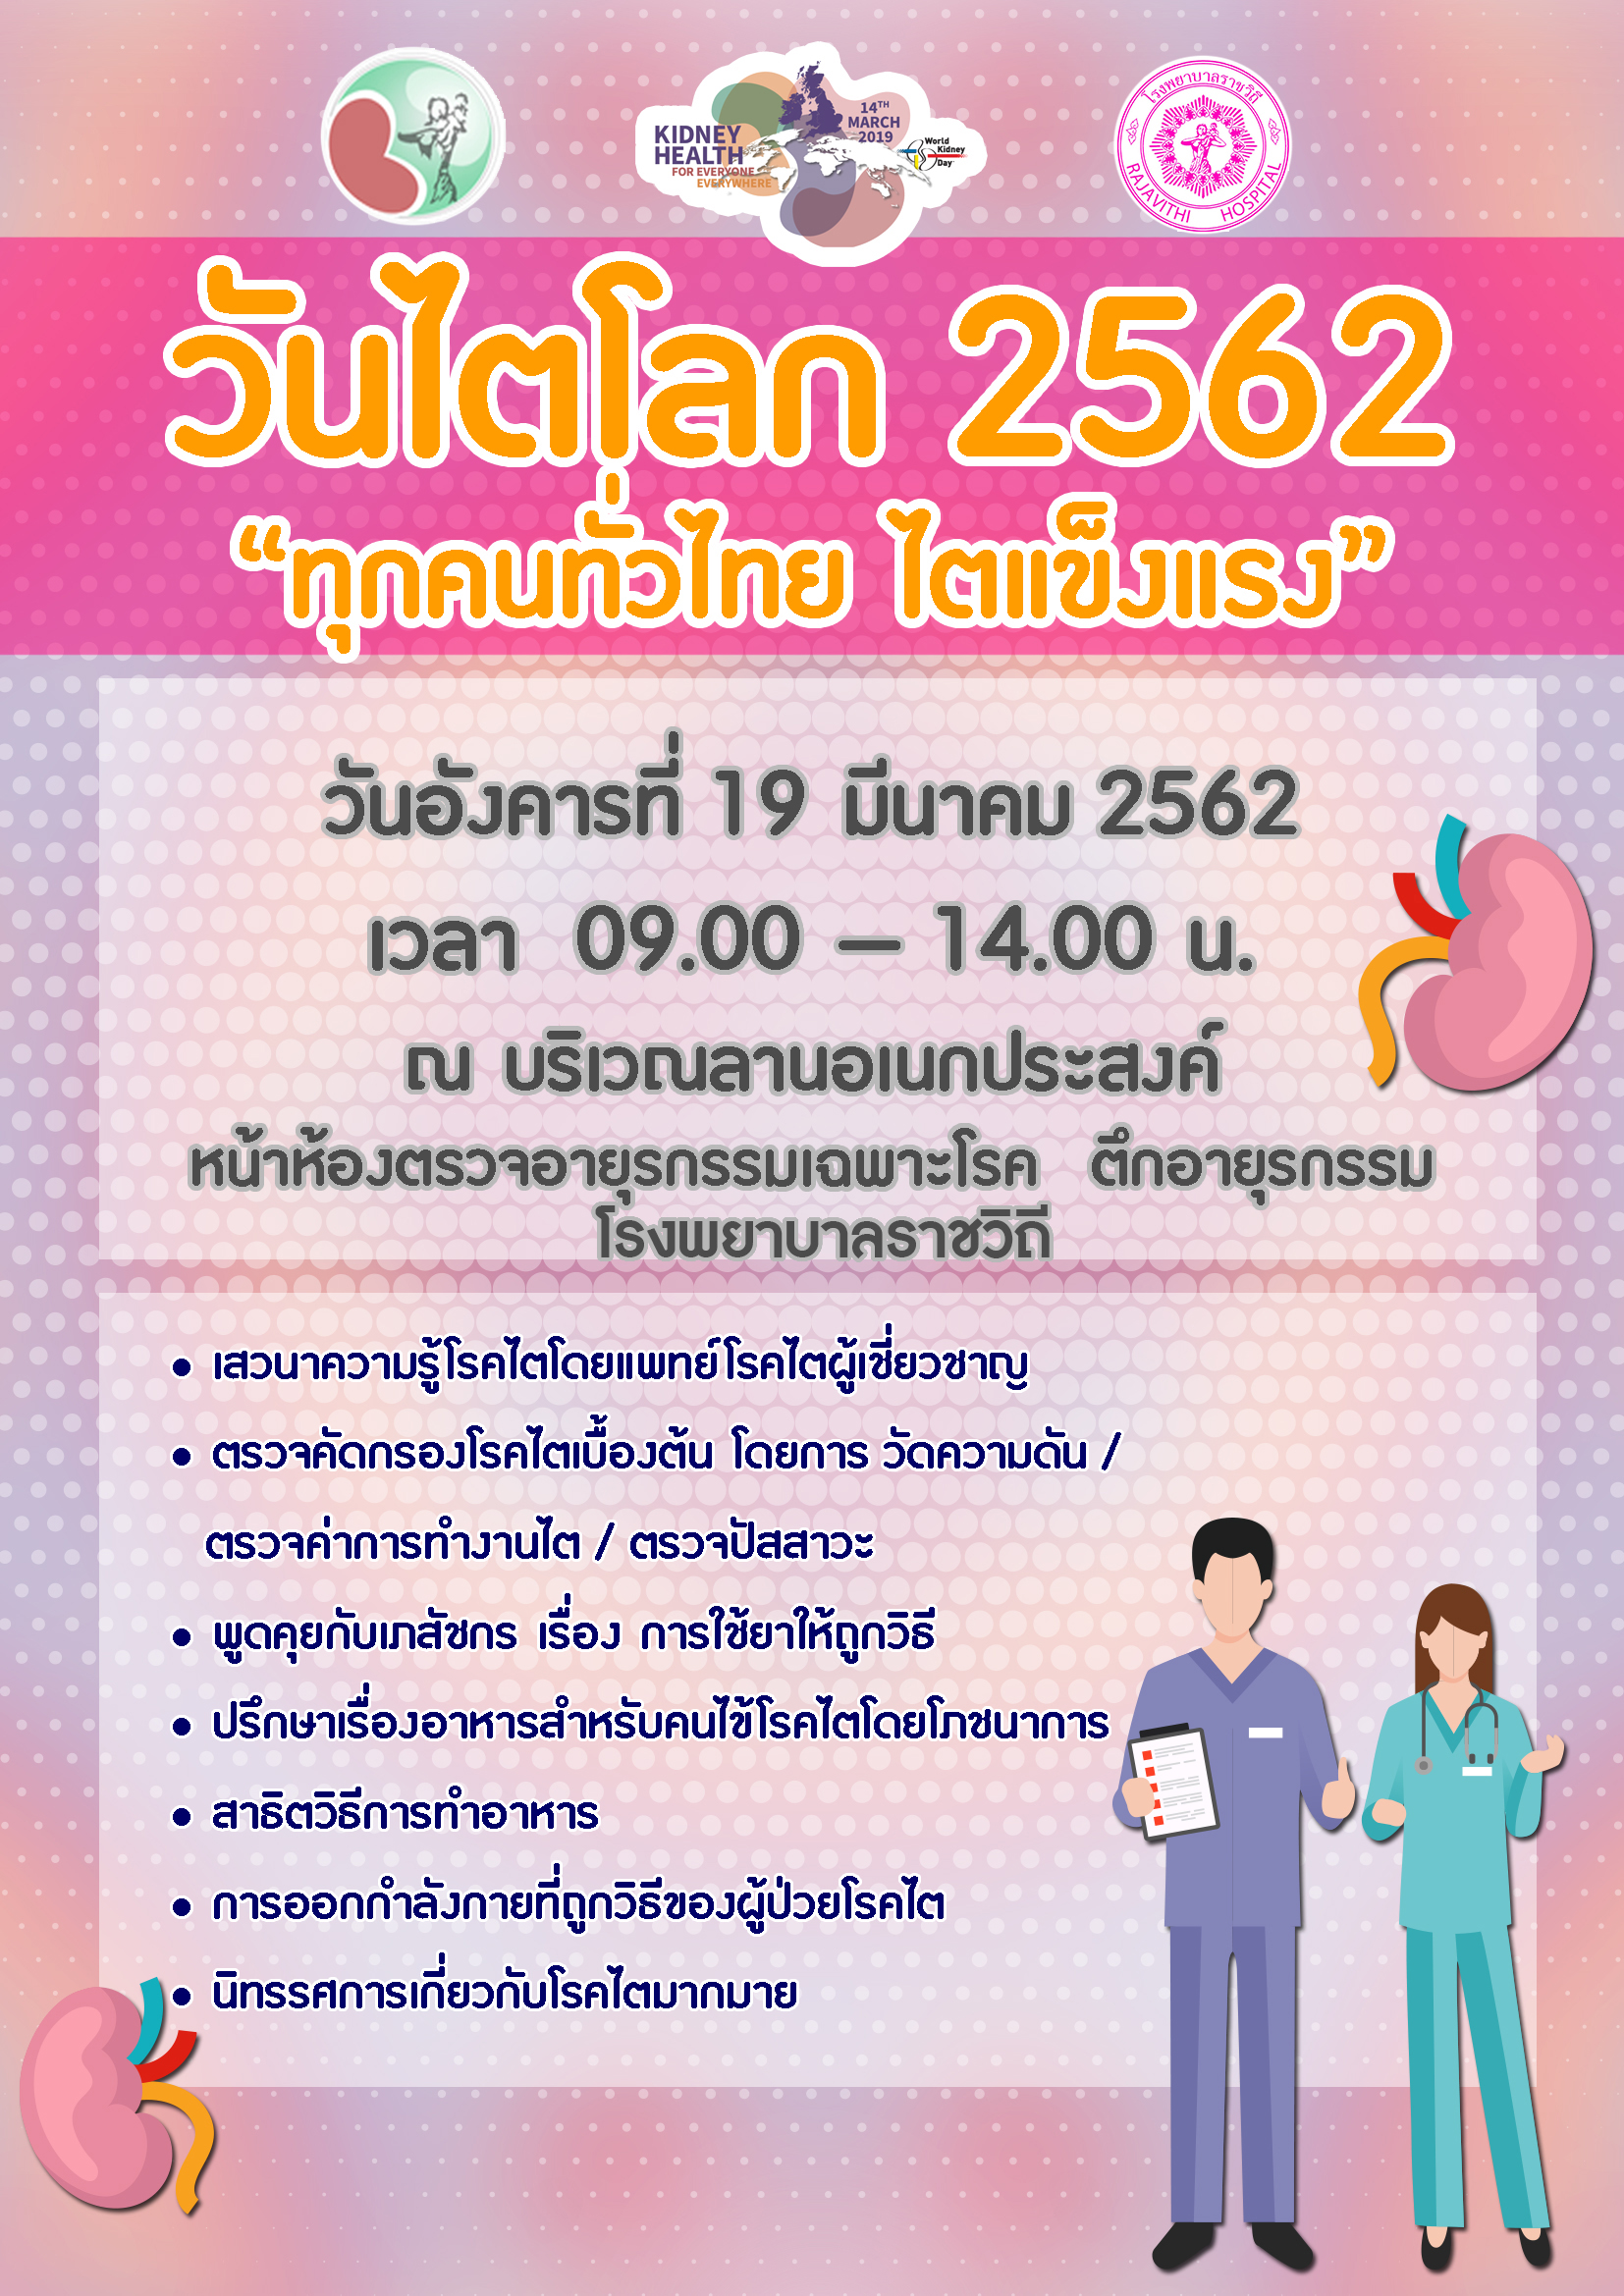 edit-kidney_poster